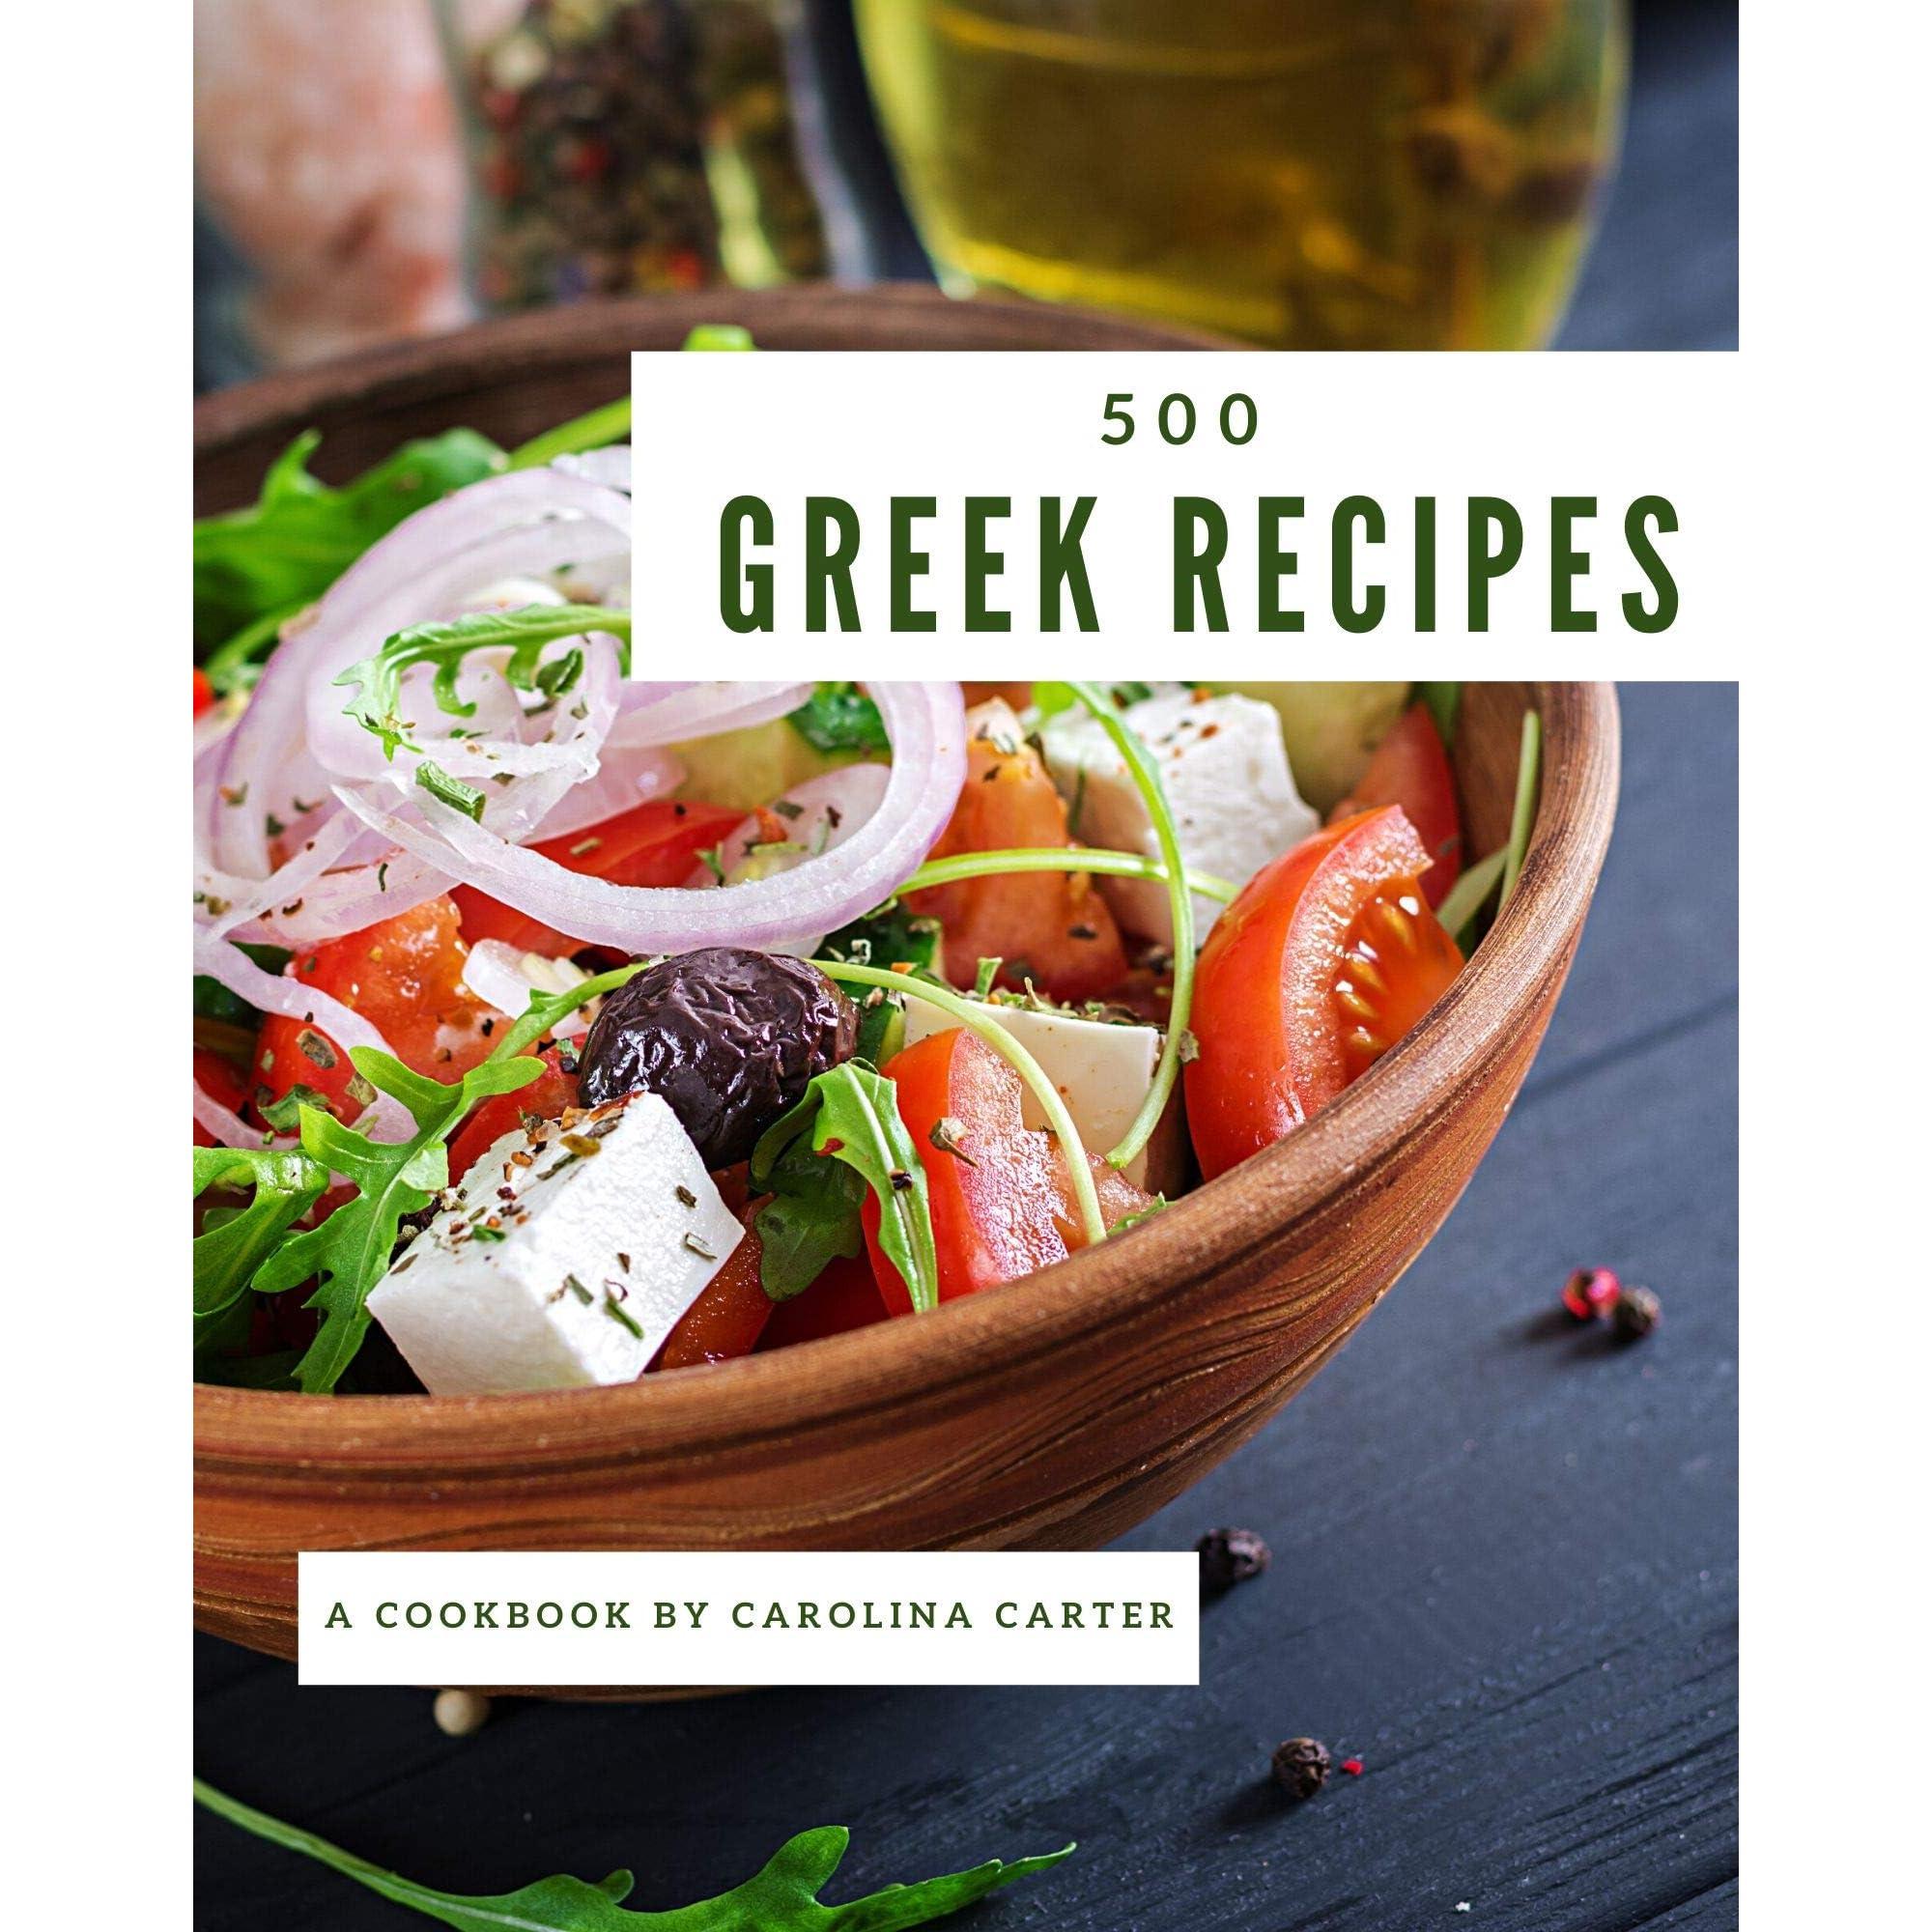 500 Greek Recipes The Best Greek Cookbook On Earth By Carolina Carter